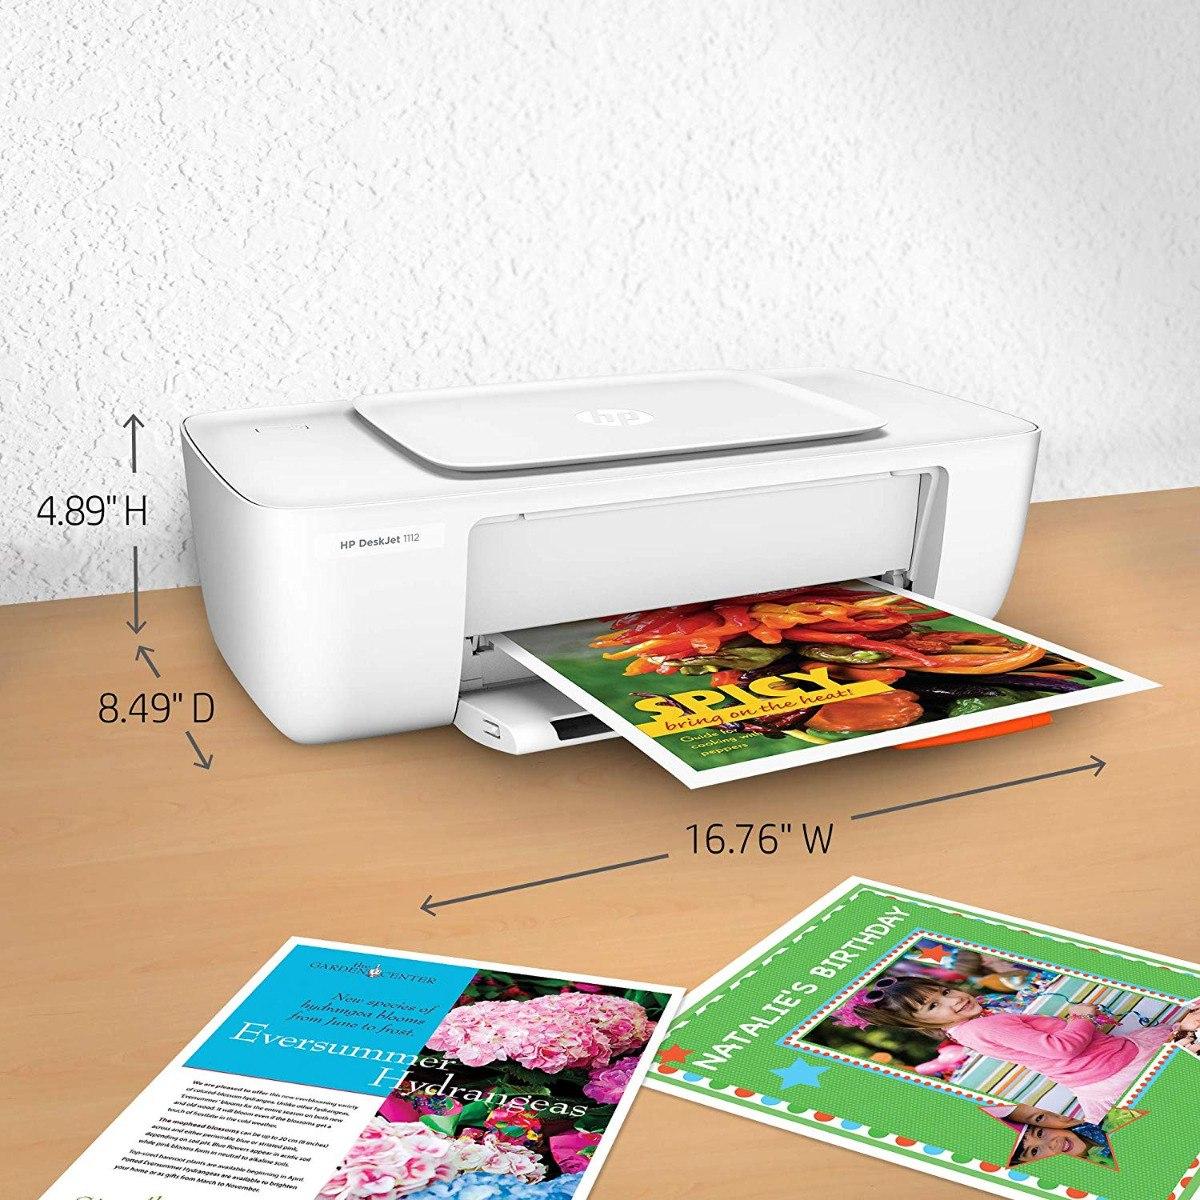 Hp Deskjet 1112 Impresora Fotogrfica Compacta 242500 En Printer Cargando Zoom